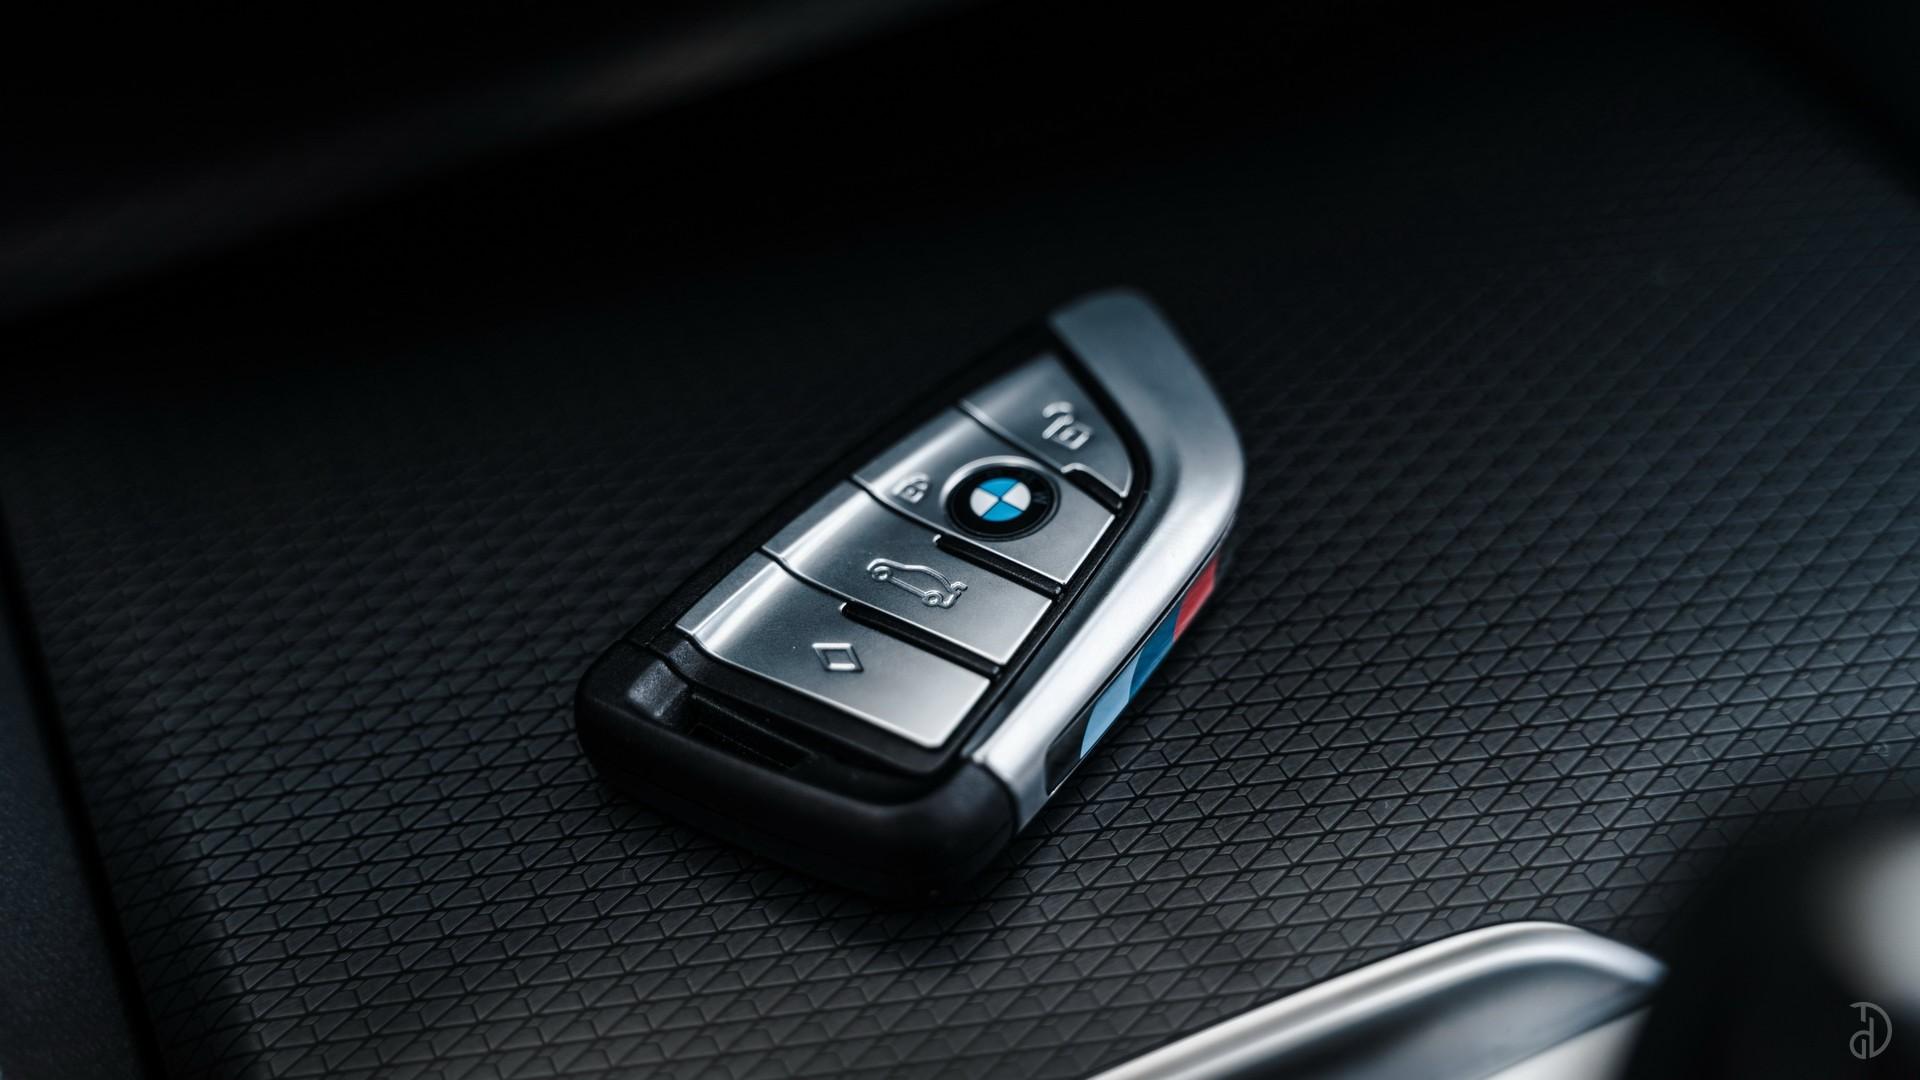 Аренда BMW 520d G30 в Сочи. Фото 13